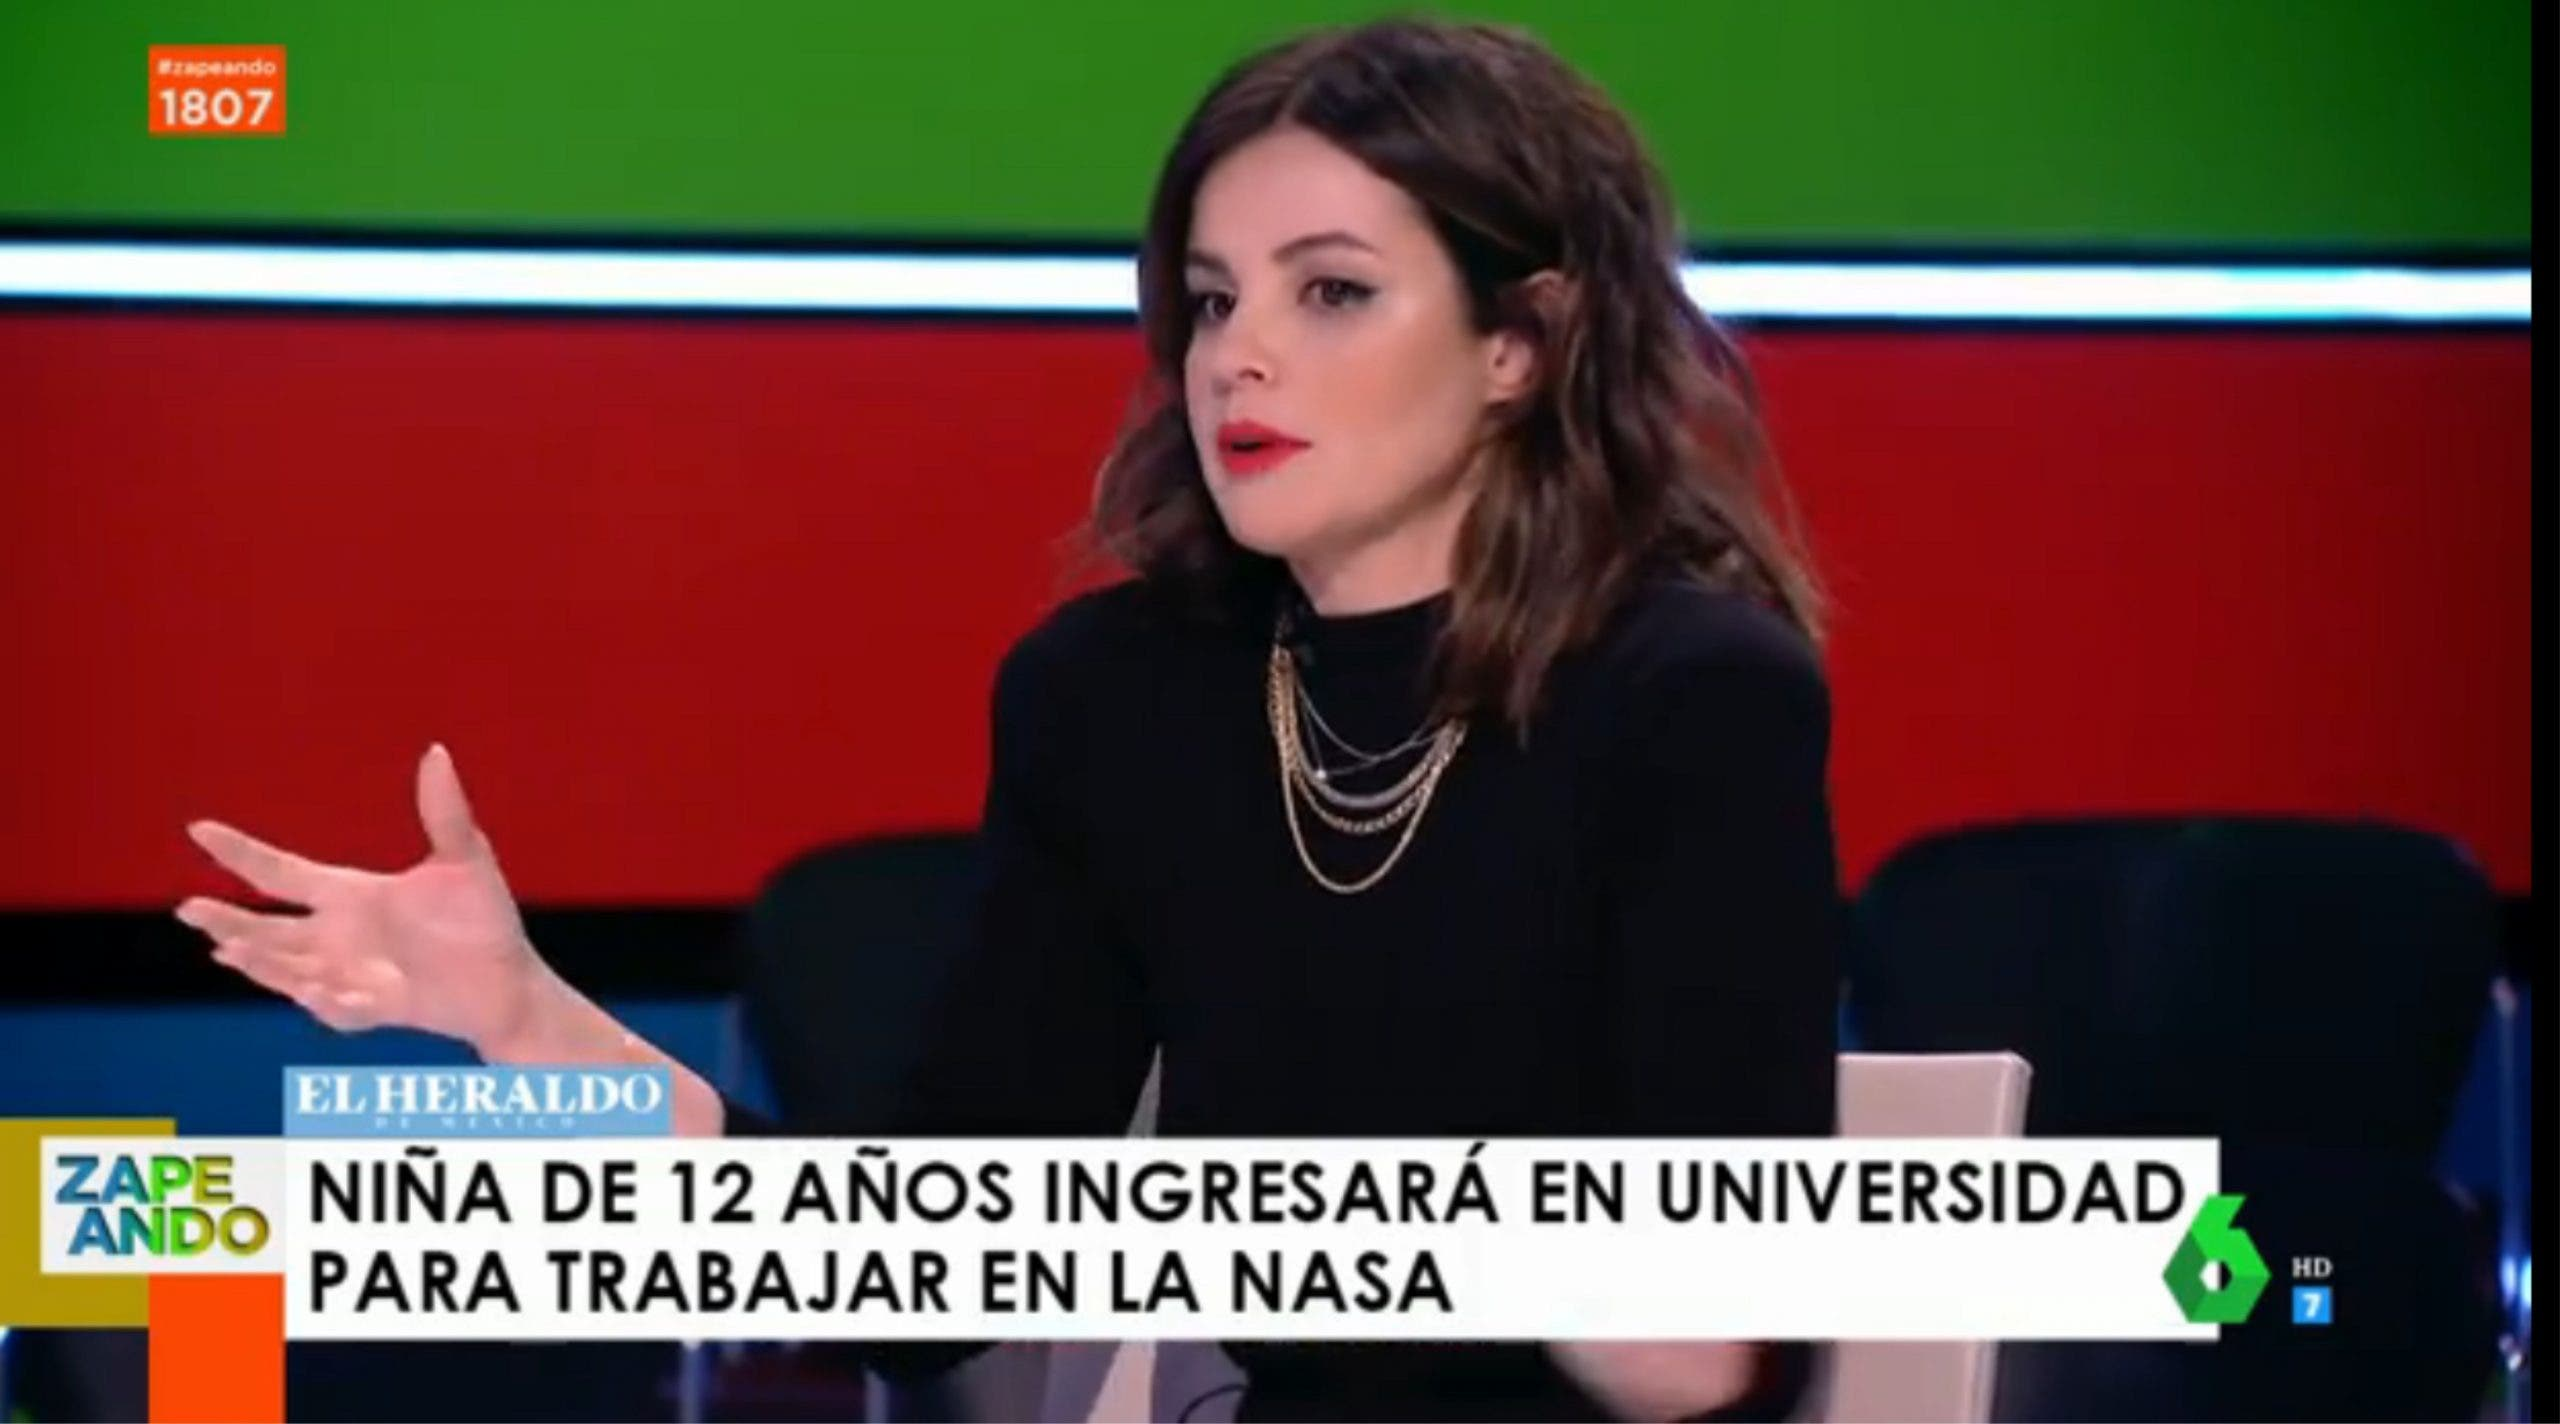 Marta Torné Zapeando